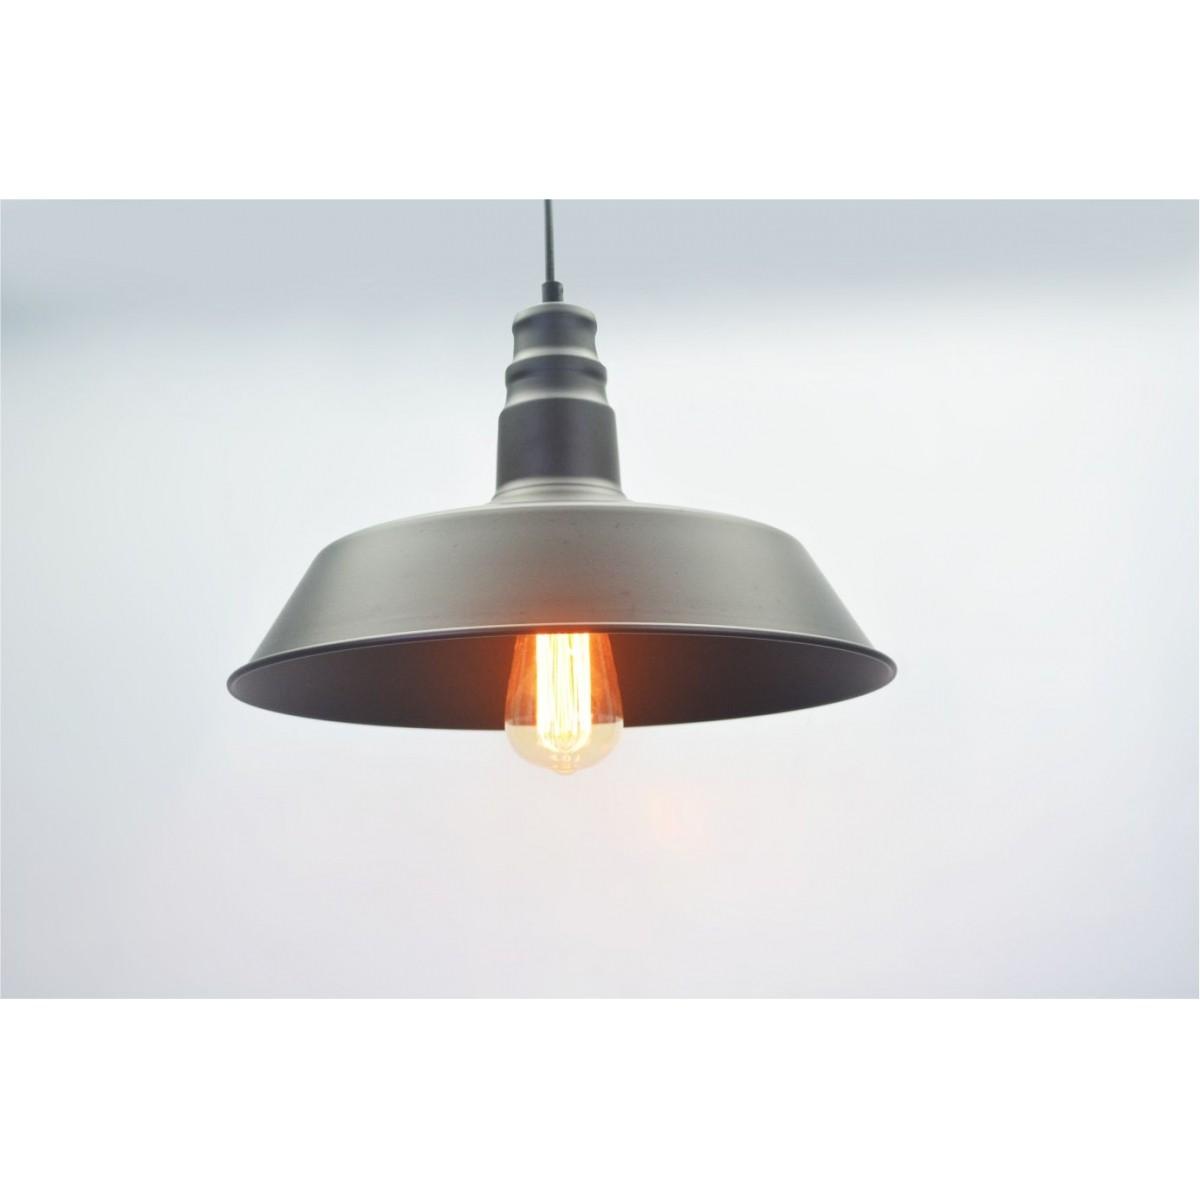 Lustre Pendente Retro Industrial I Metal Pelegrin PEL-035